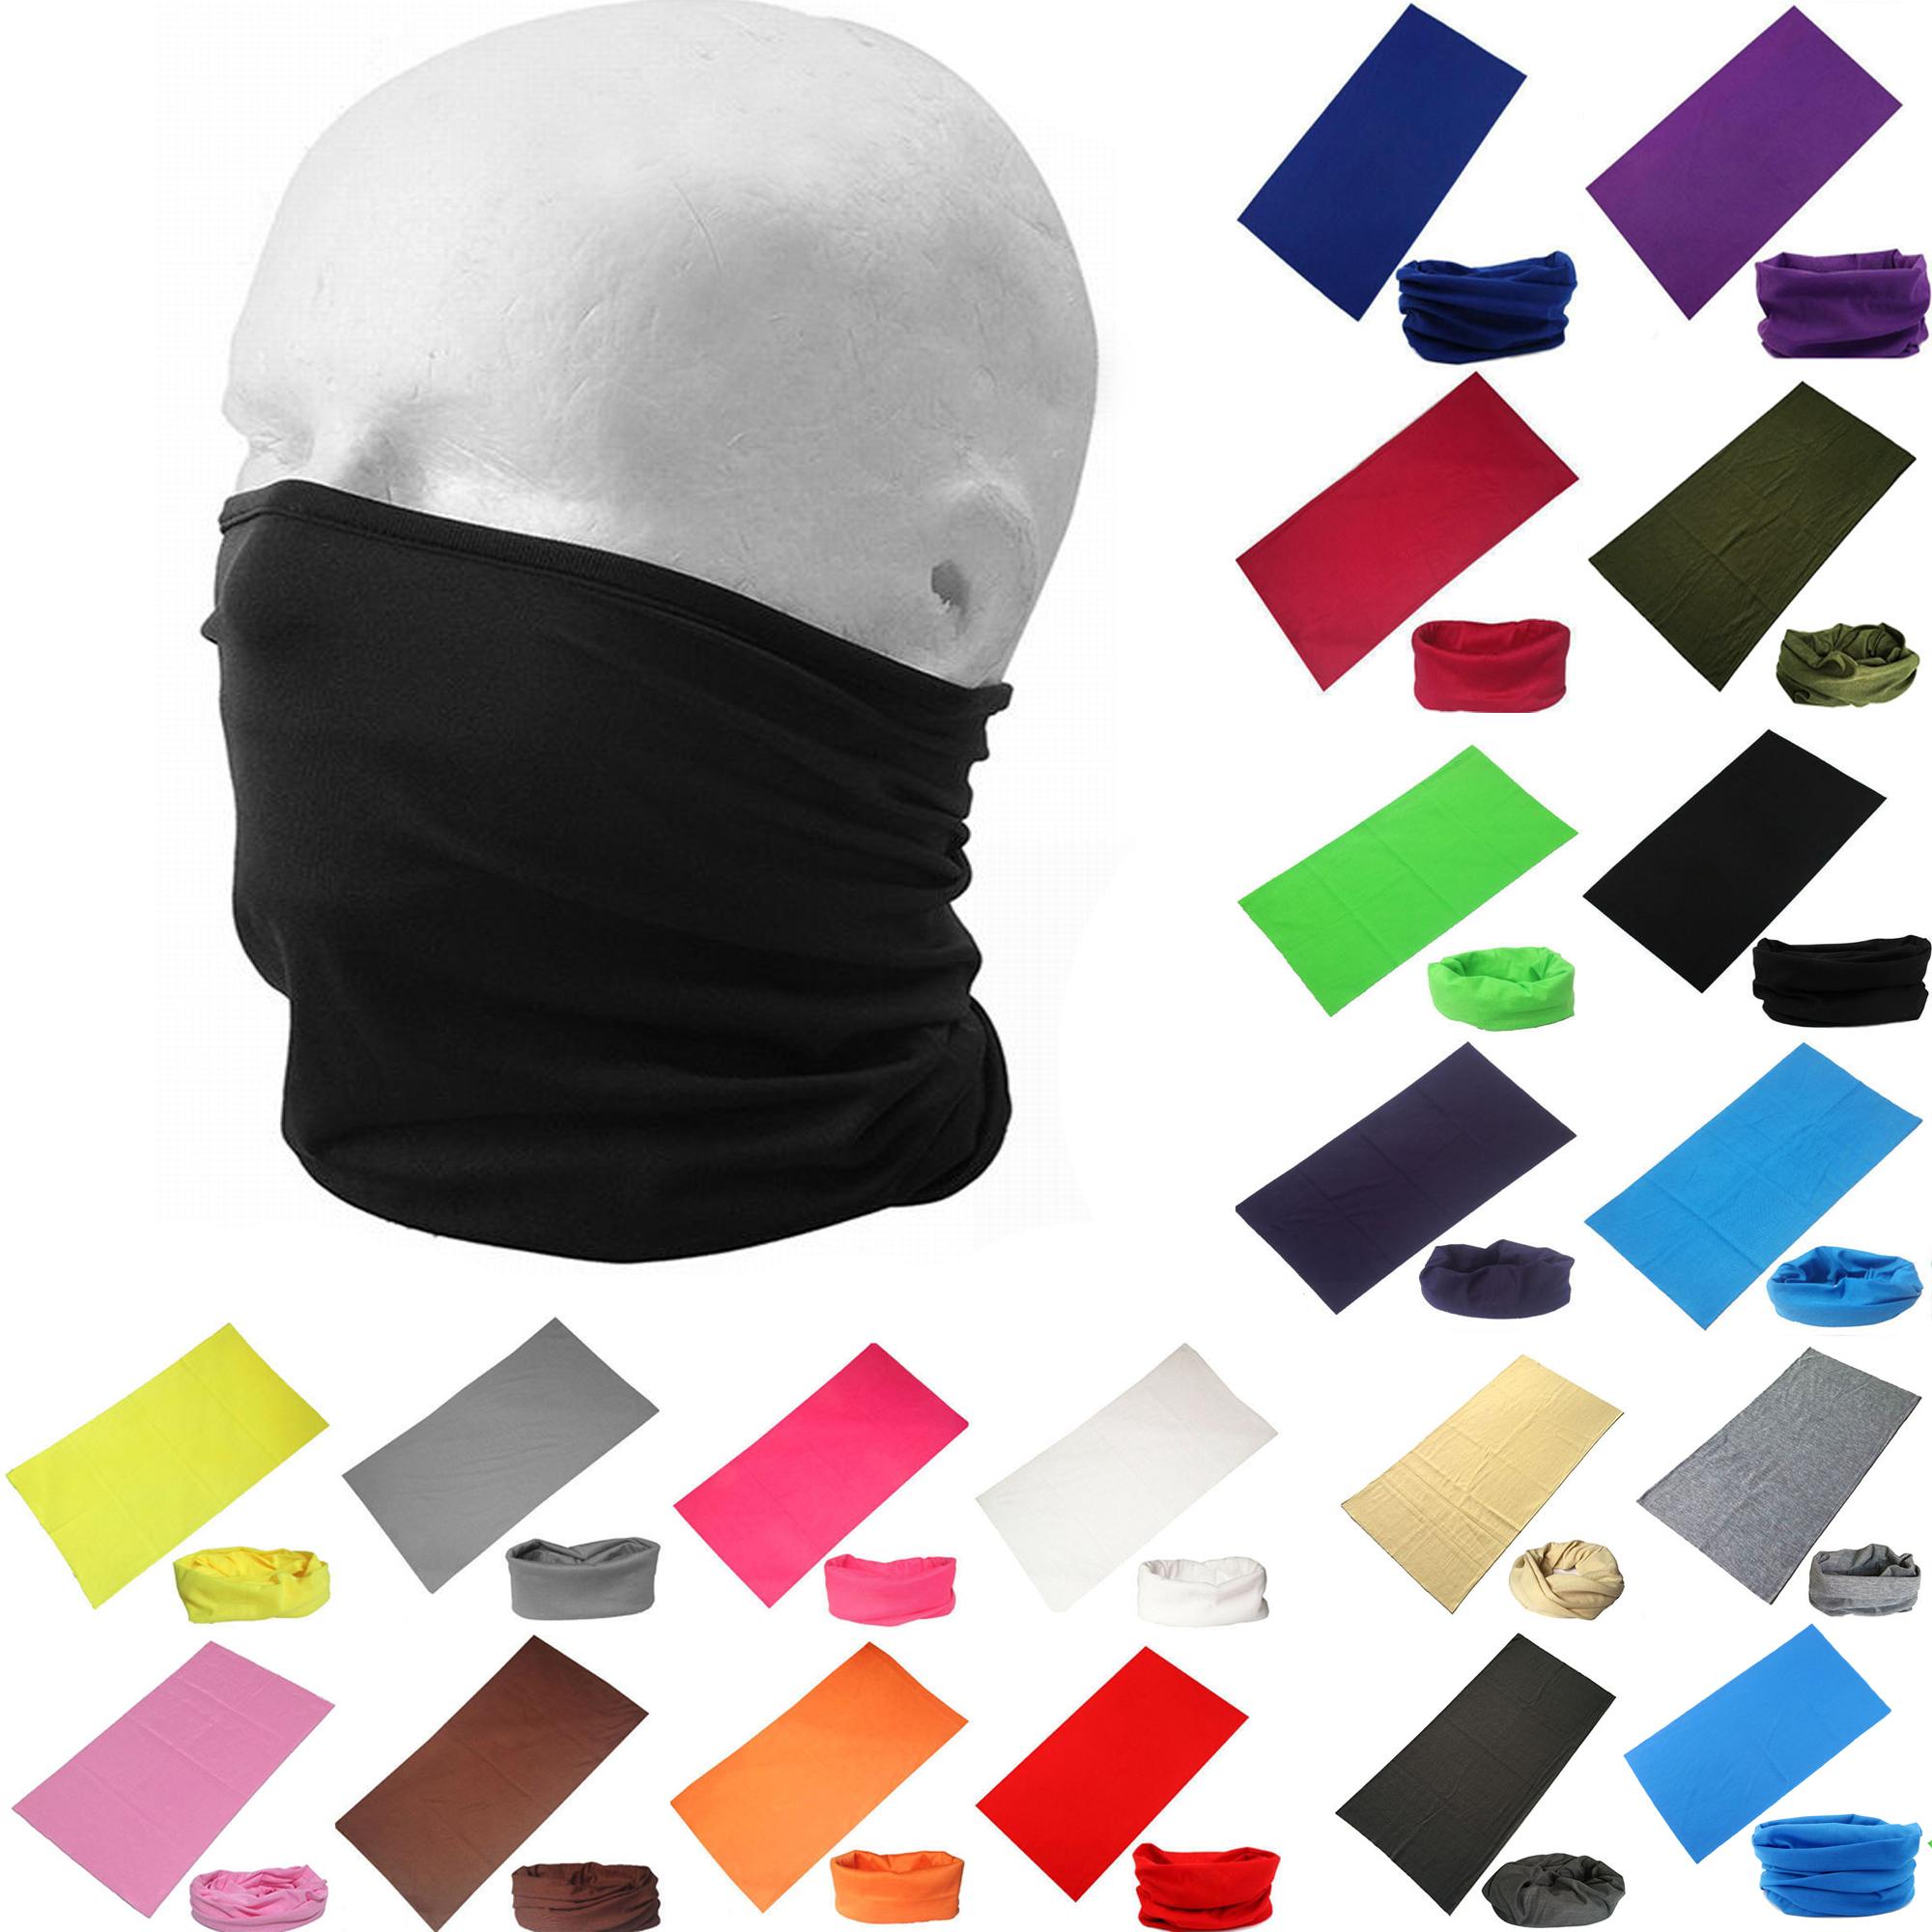 branded-face-mask-face-shield-multi-use-scarf-va-dc-md-ny